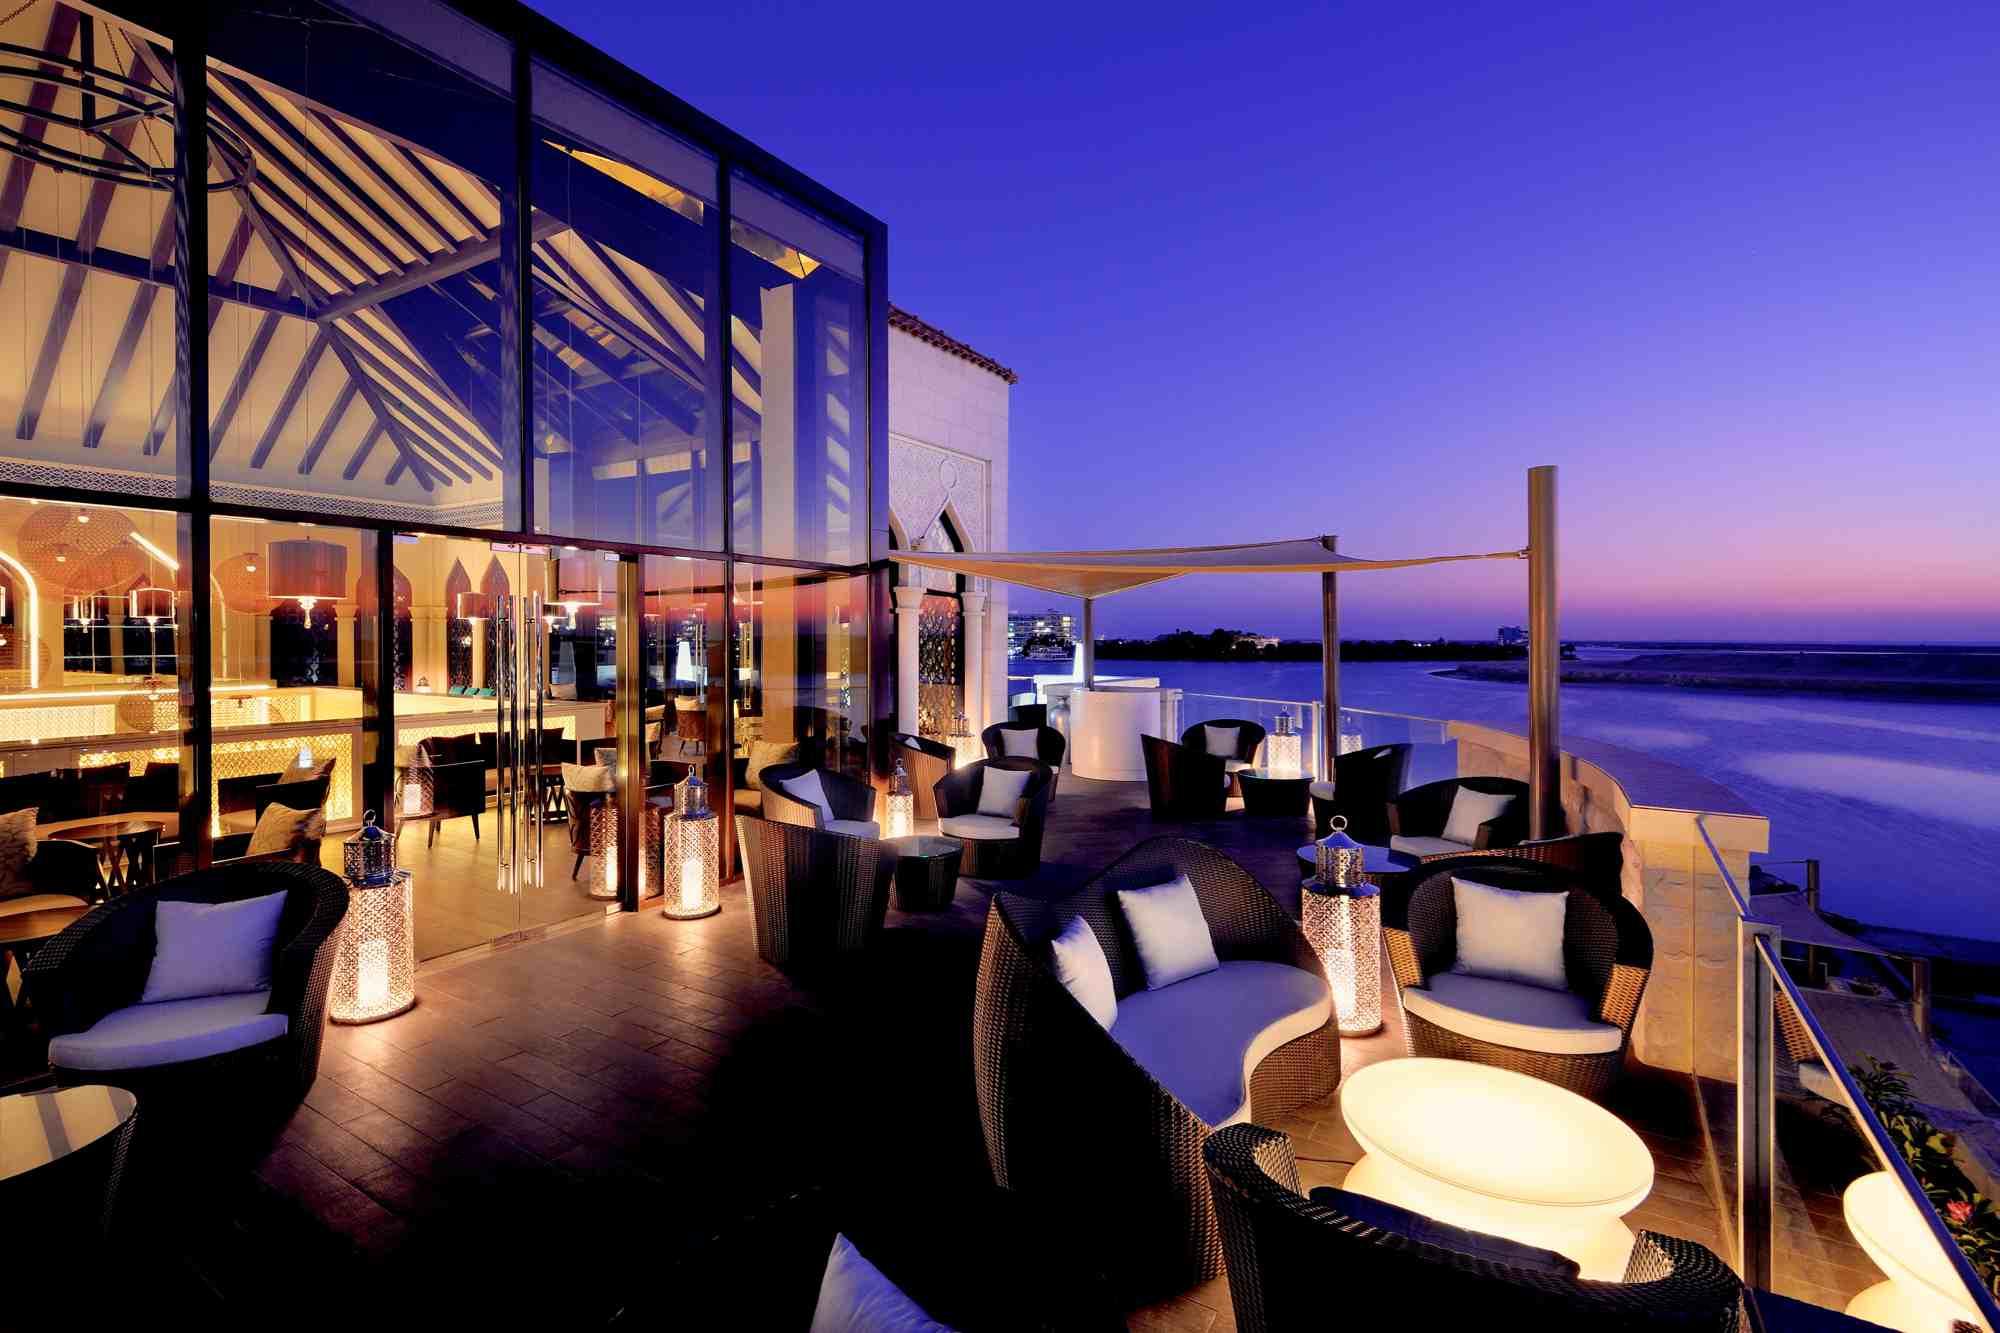 Marina in the evening at InterContinental Hotel Abu Dhabi